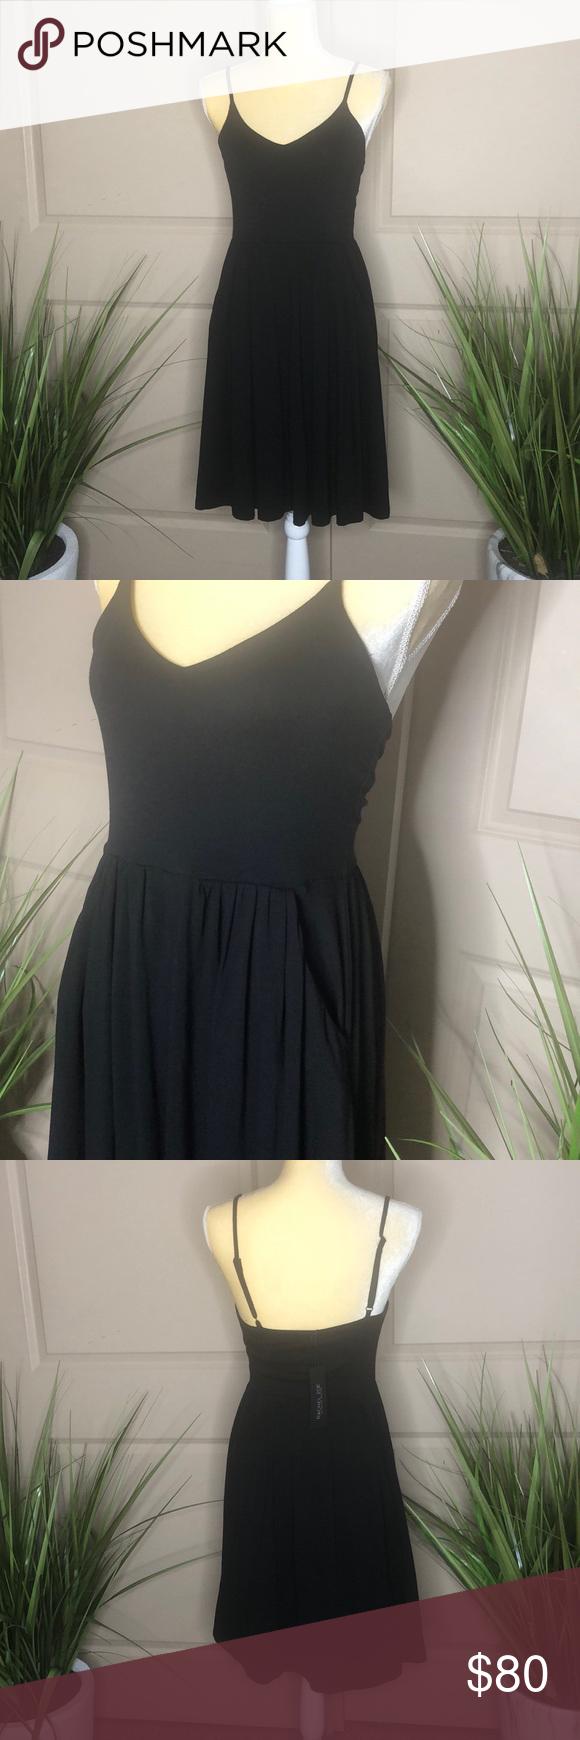 Rachel Zoe Black Dress Short Black Dress With Pockets 96 Rayon 4 Spandex Rachel Zoe Dresses Midi Black Dress Black Short Dress Dresses [ 1740 x 580 Pixel ]